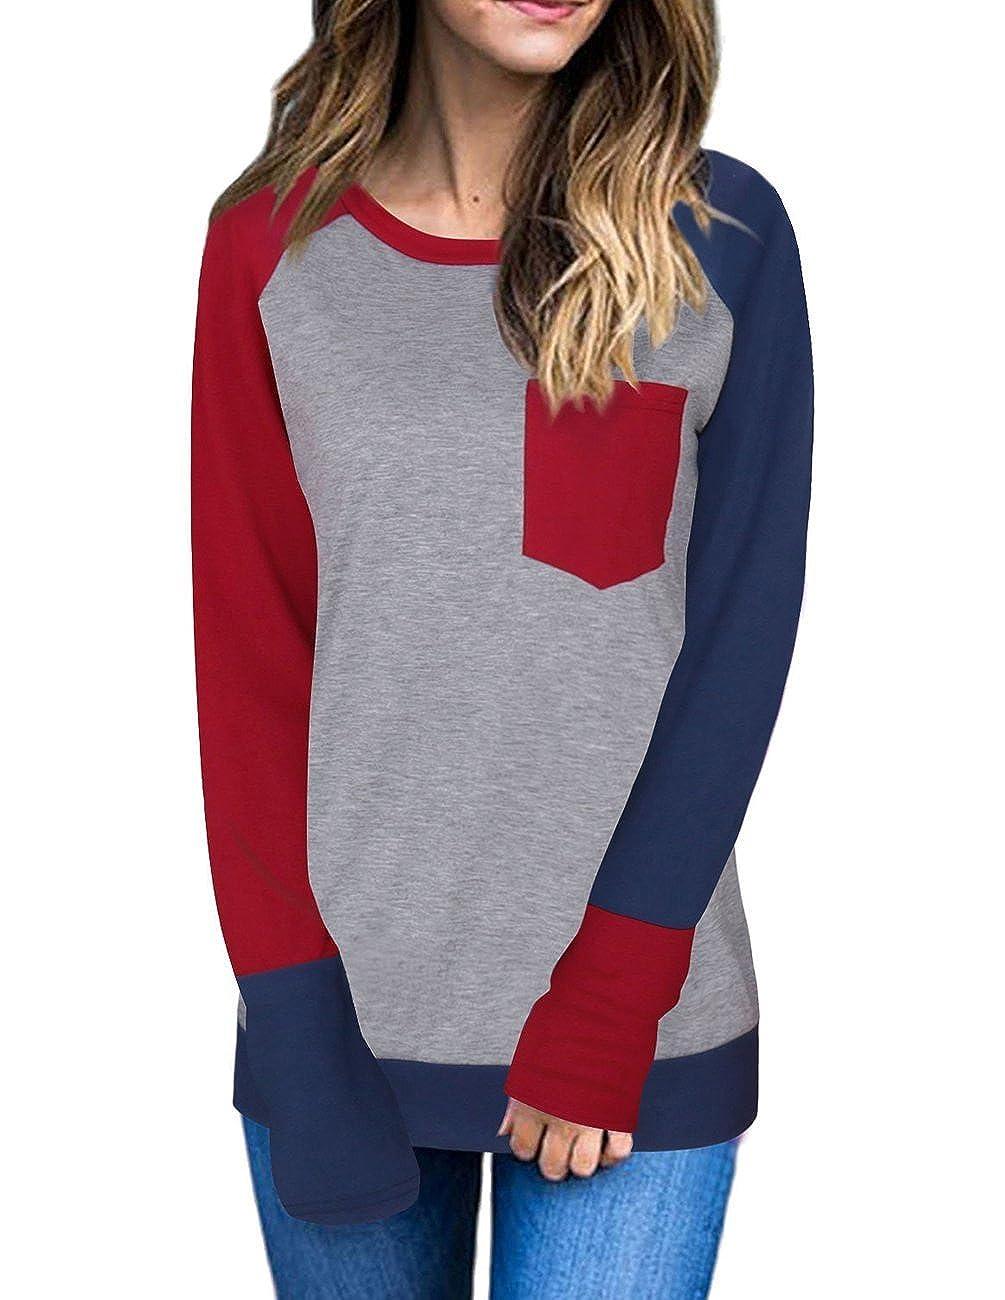 08151ce56aeb2 Style Womens Scoop Neck Contrast Top Long Sleeve Basic Casual Tunic Shirt  Tee. Features Raglan long sleeve shirt